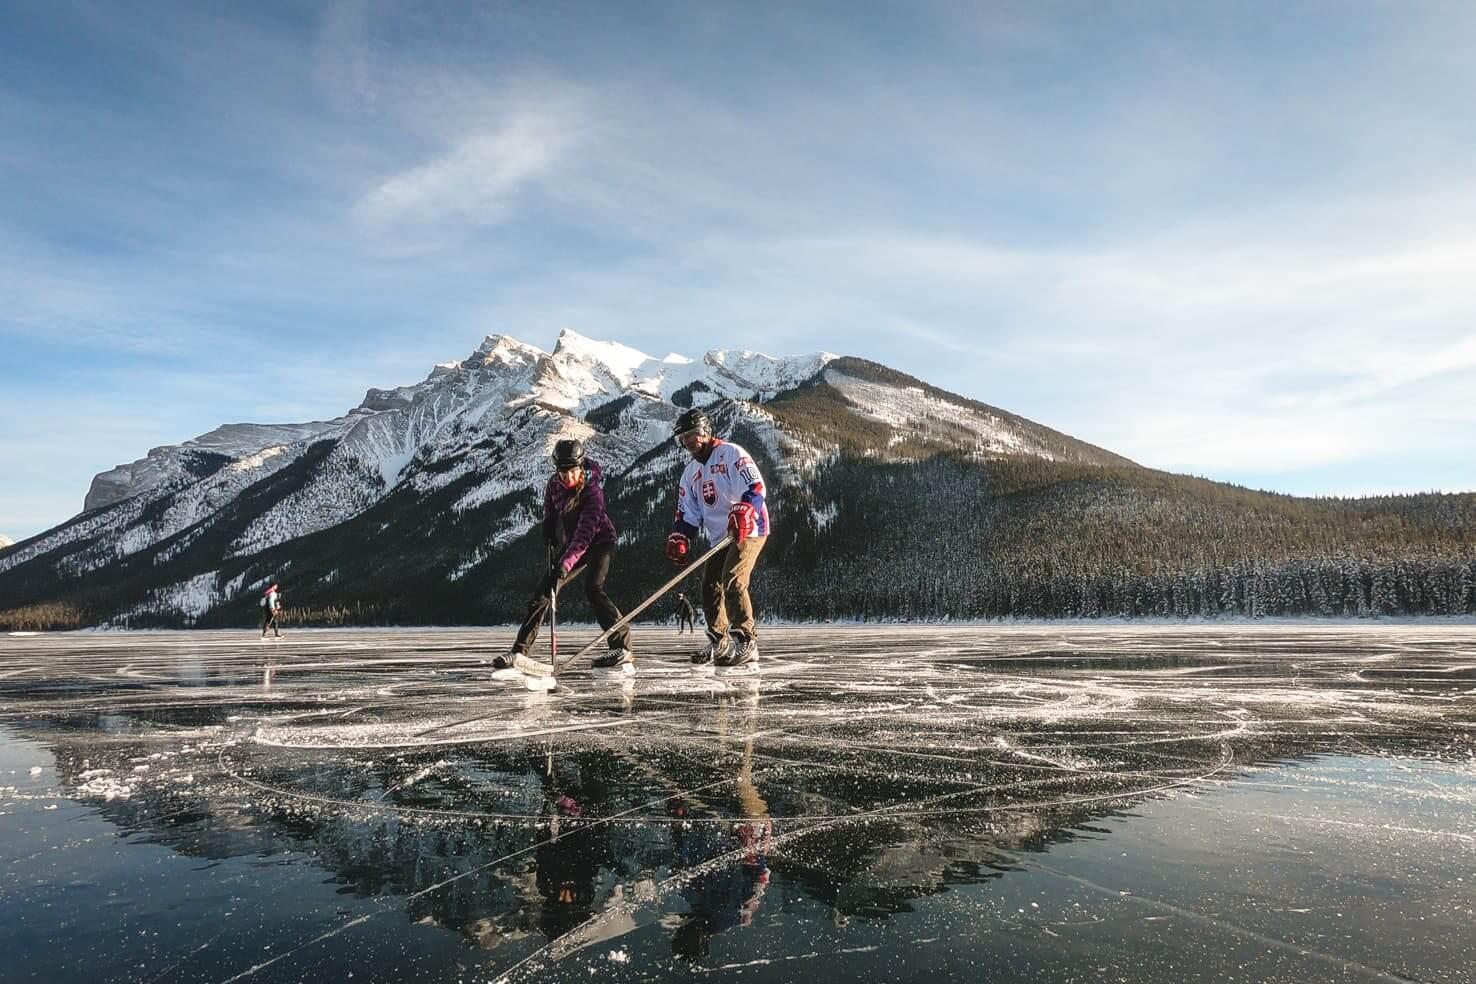 Ice skating in Banff National Park - Lake Minnewanka